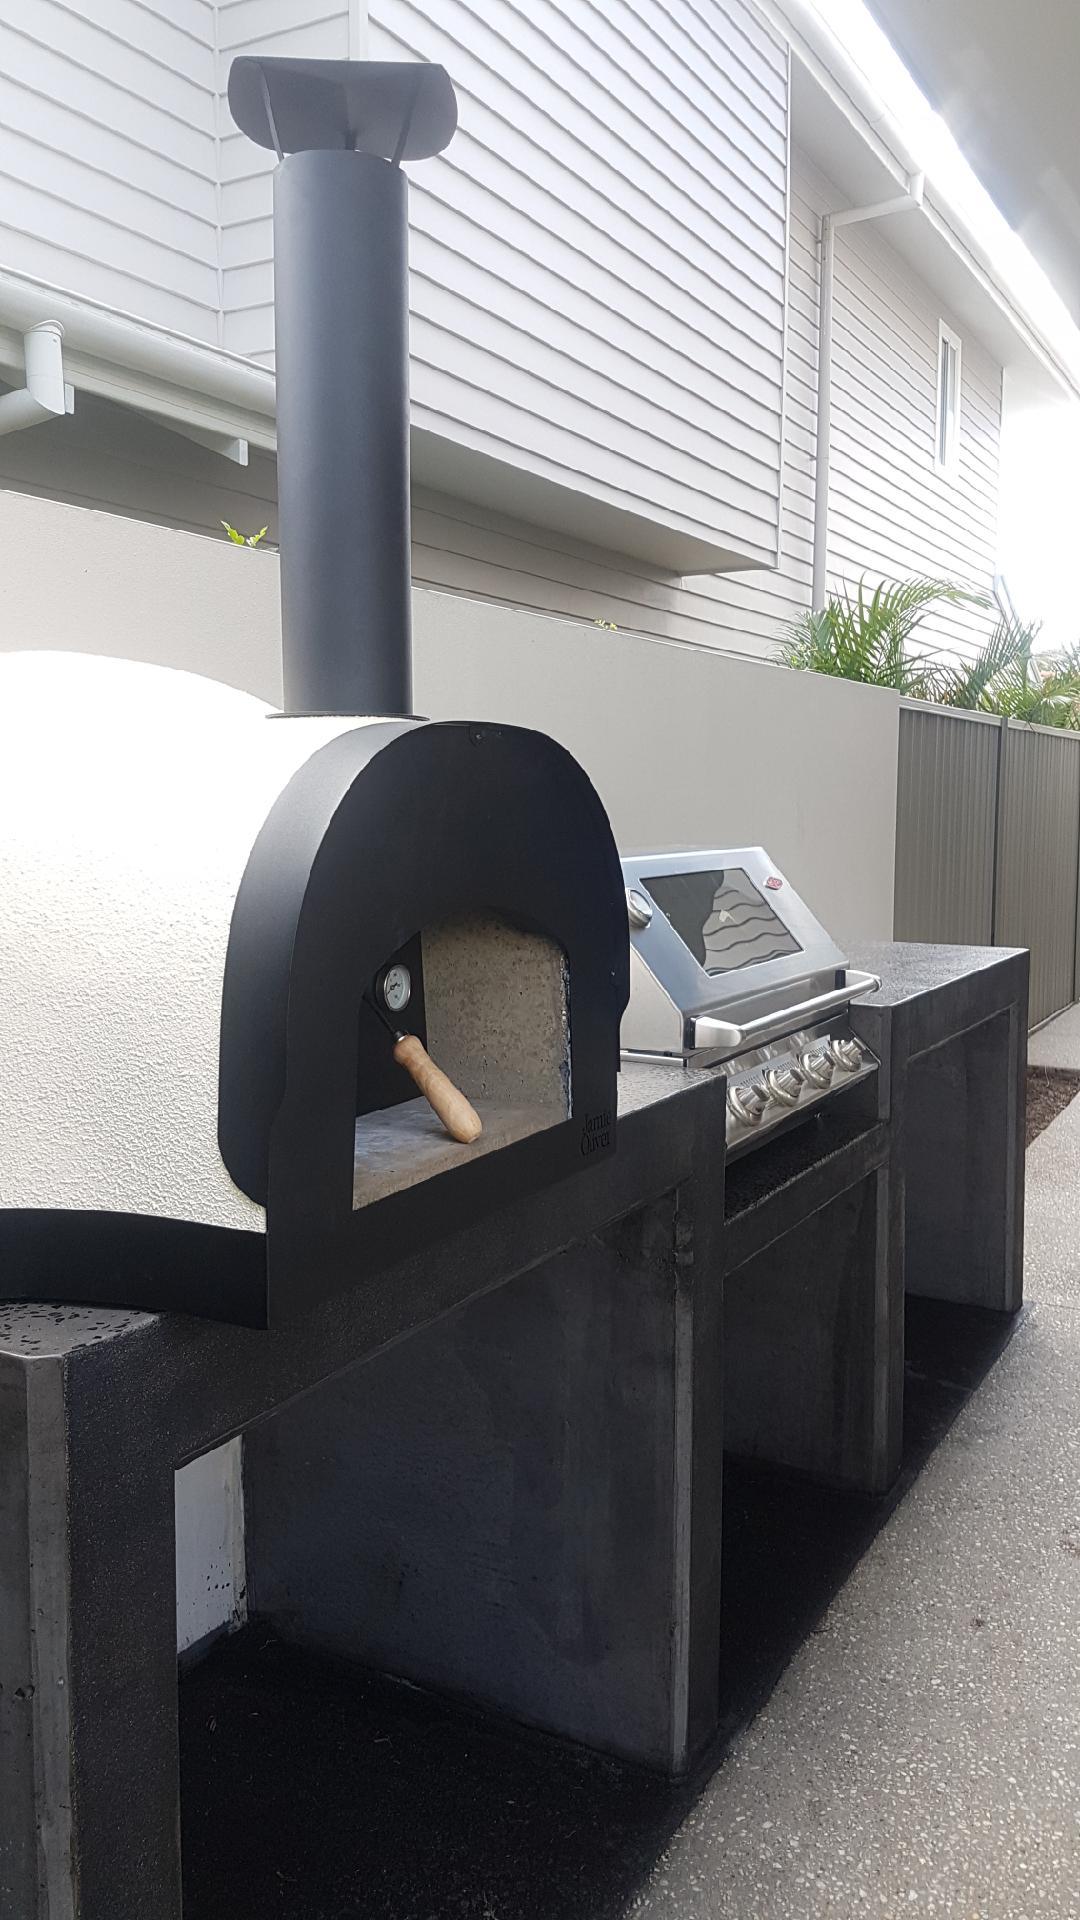 Preassembled Pizza Ovens Portable Jamie Oliver Ovens